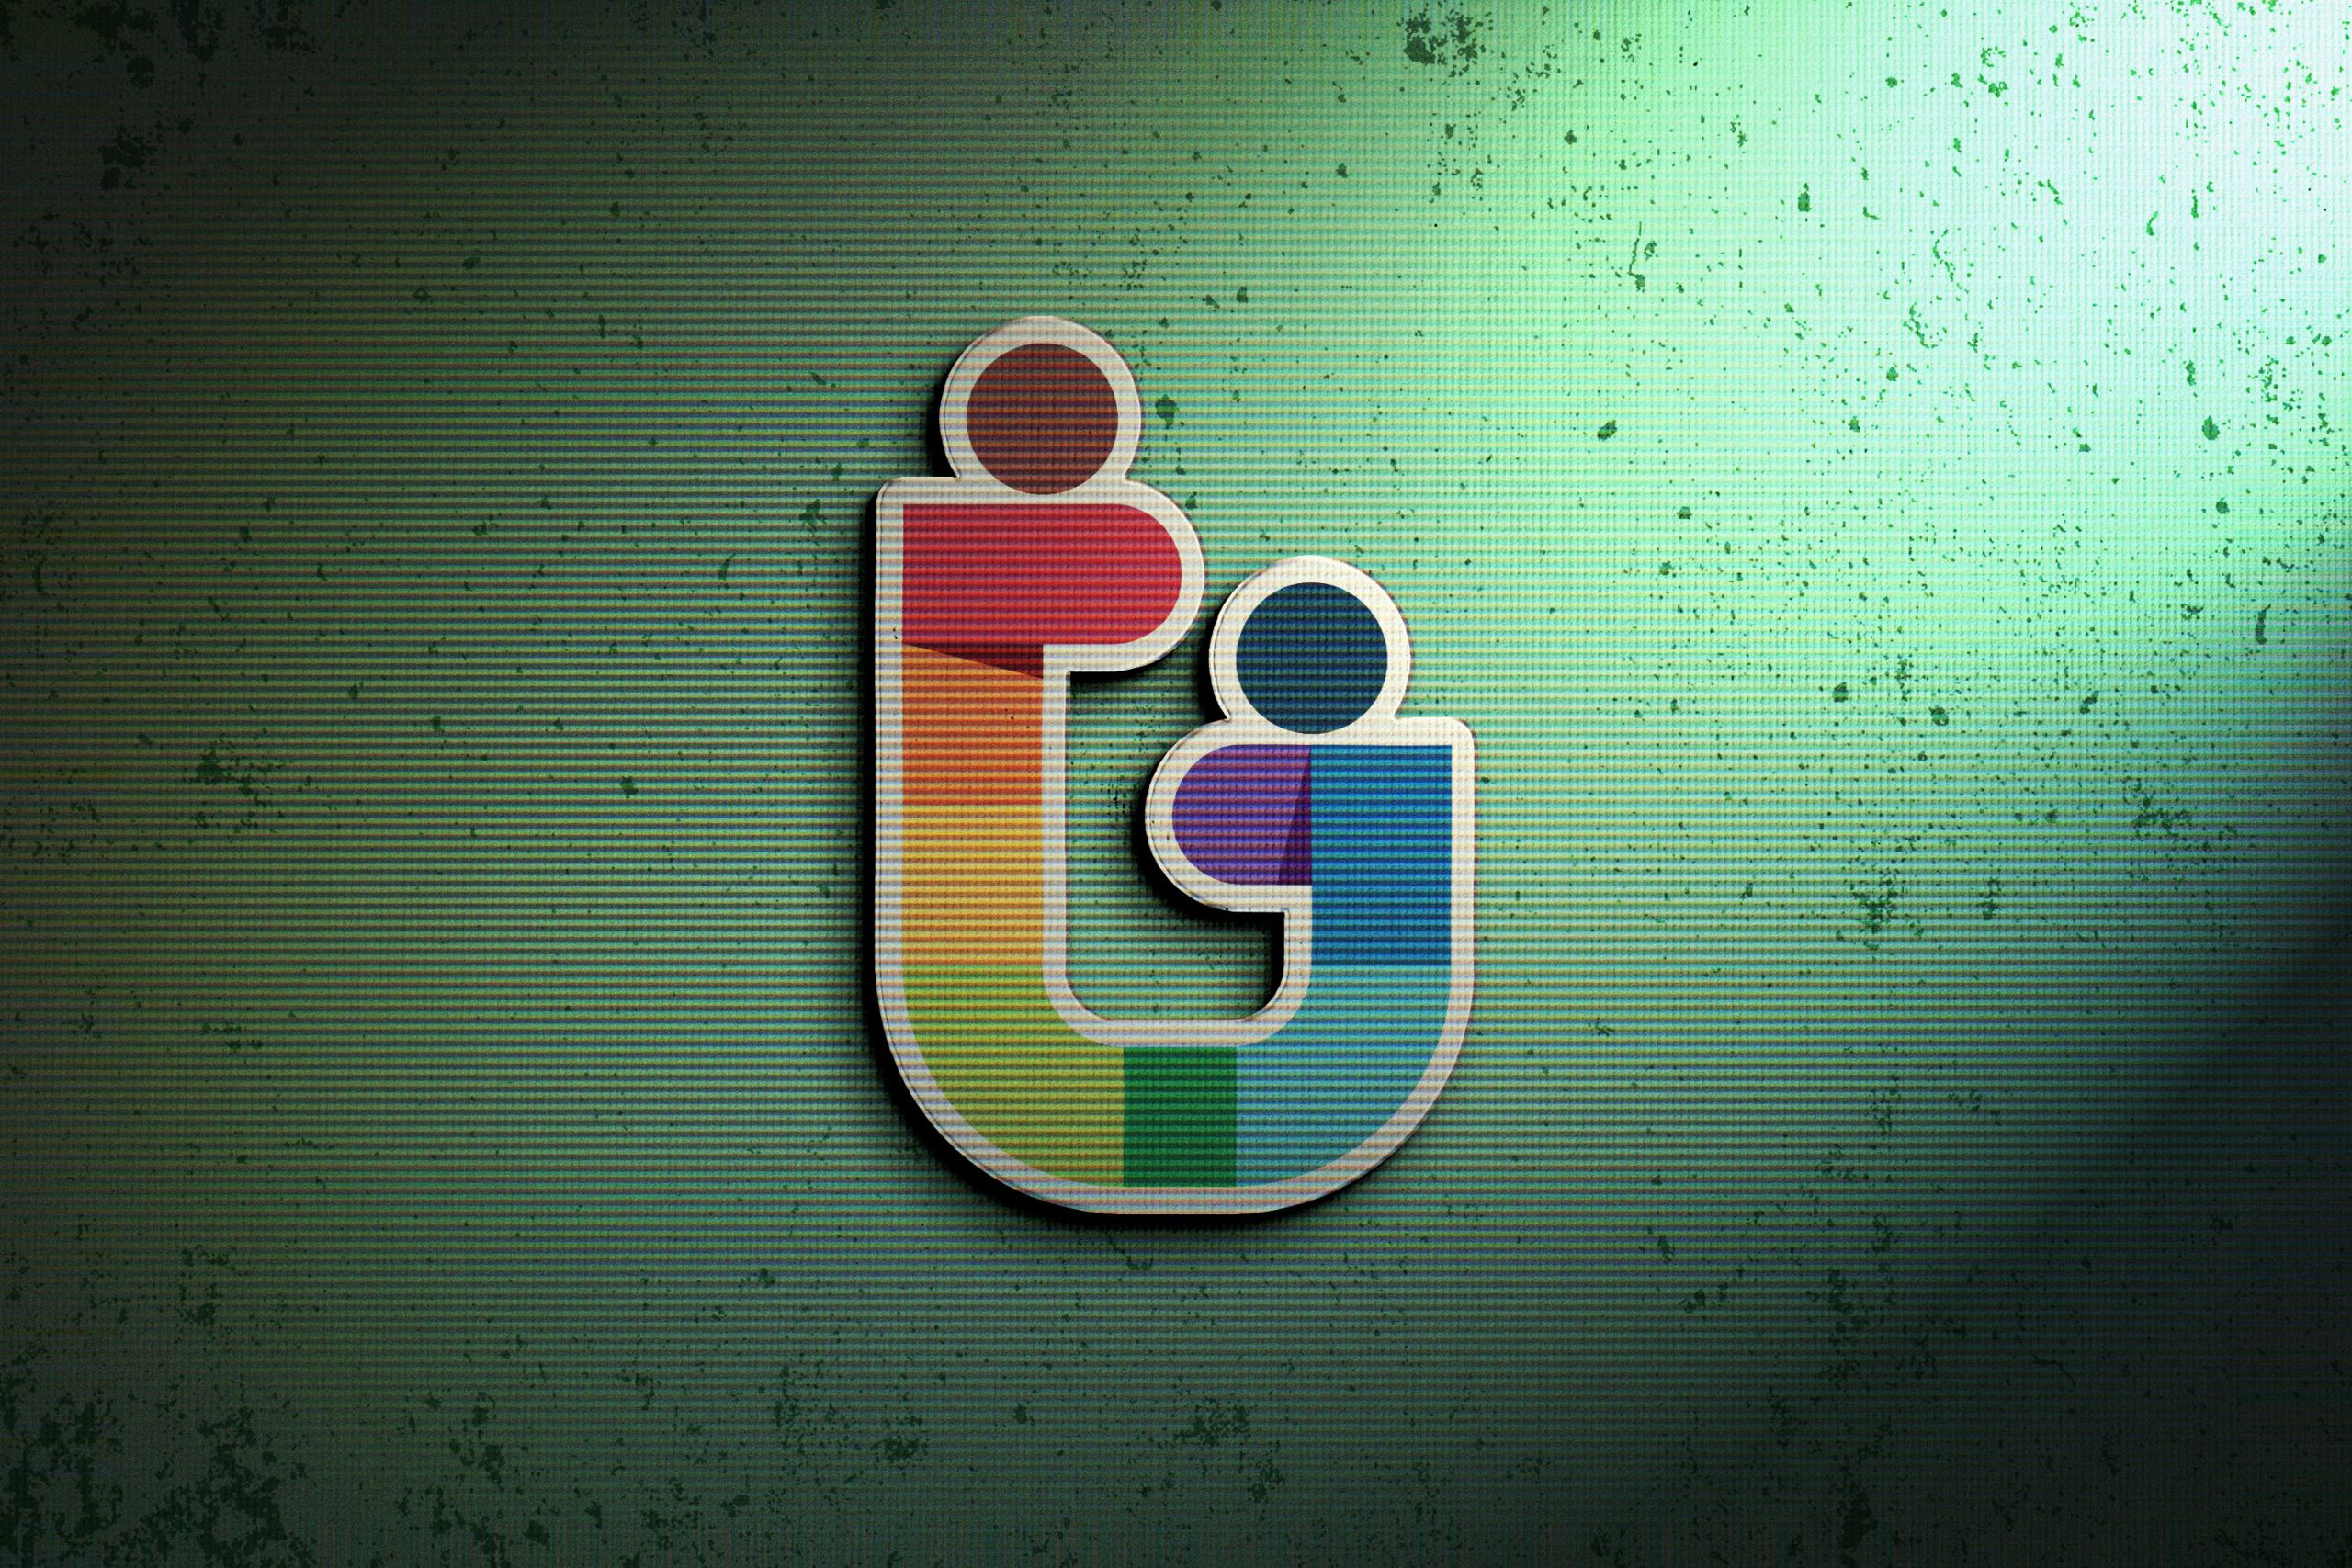 Photoshop Logo Mock-up with Retro Effects